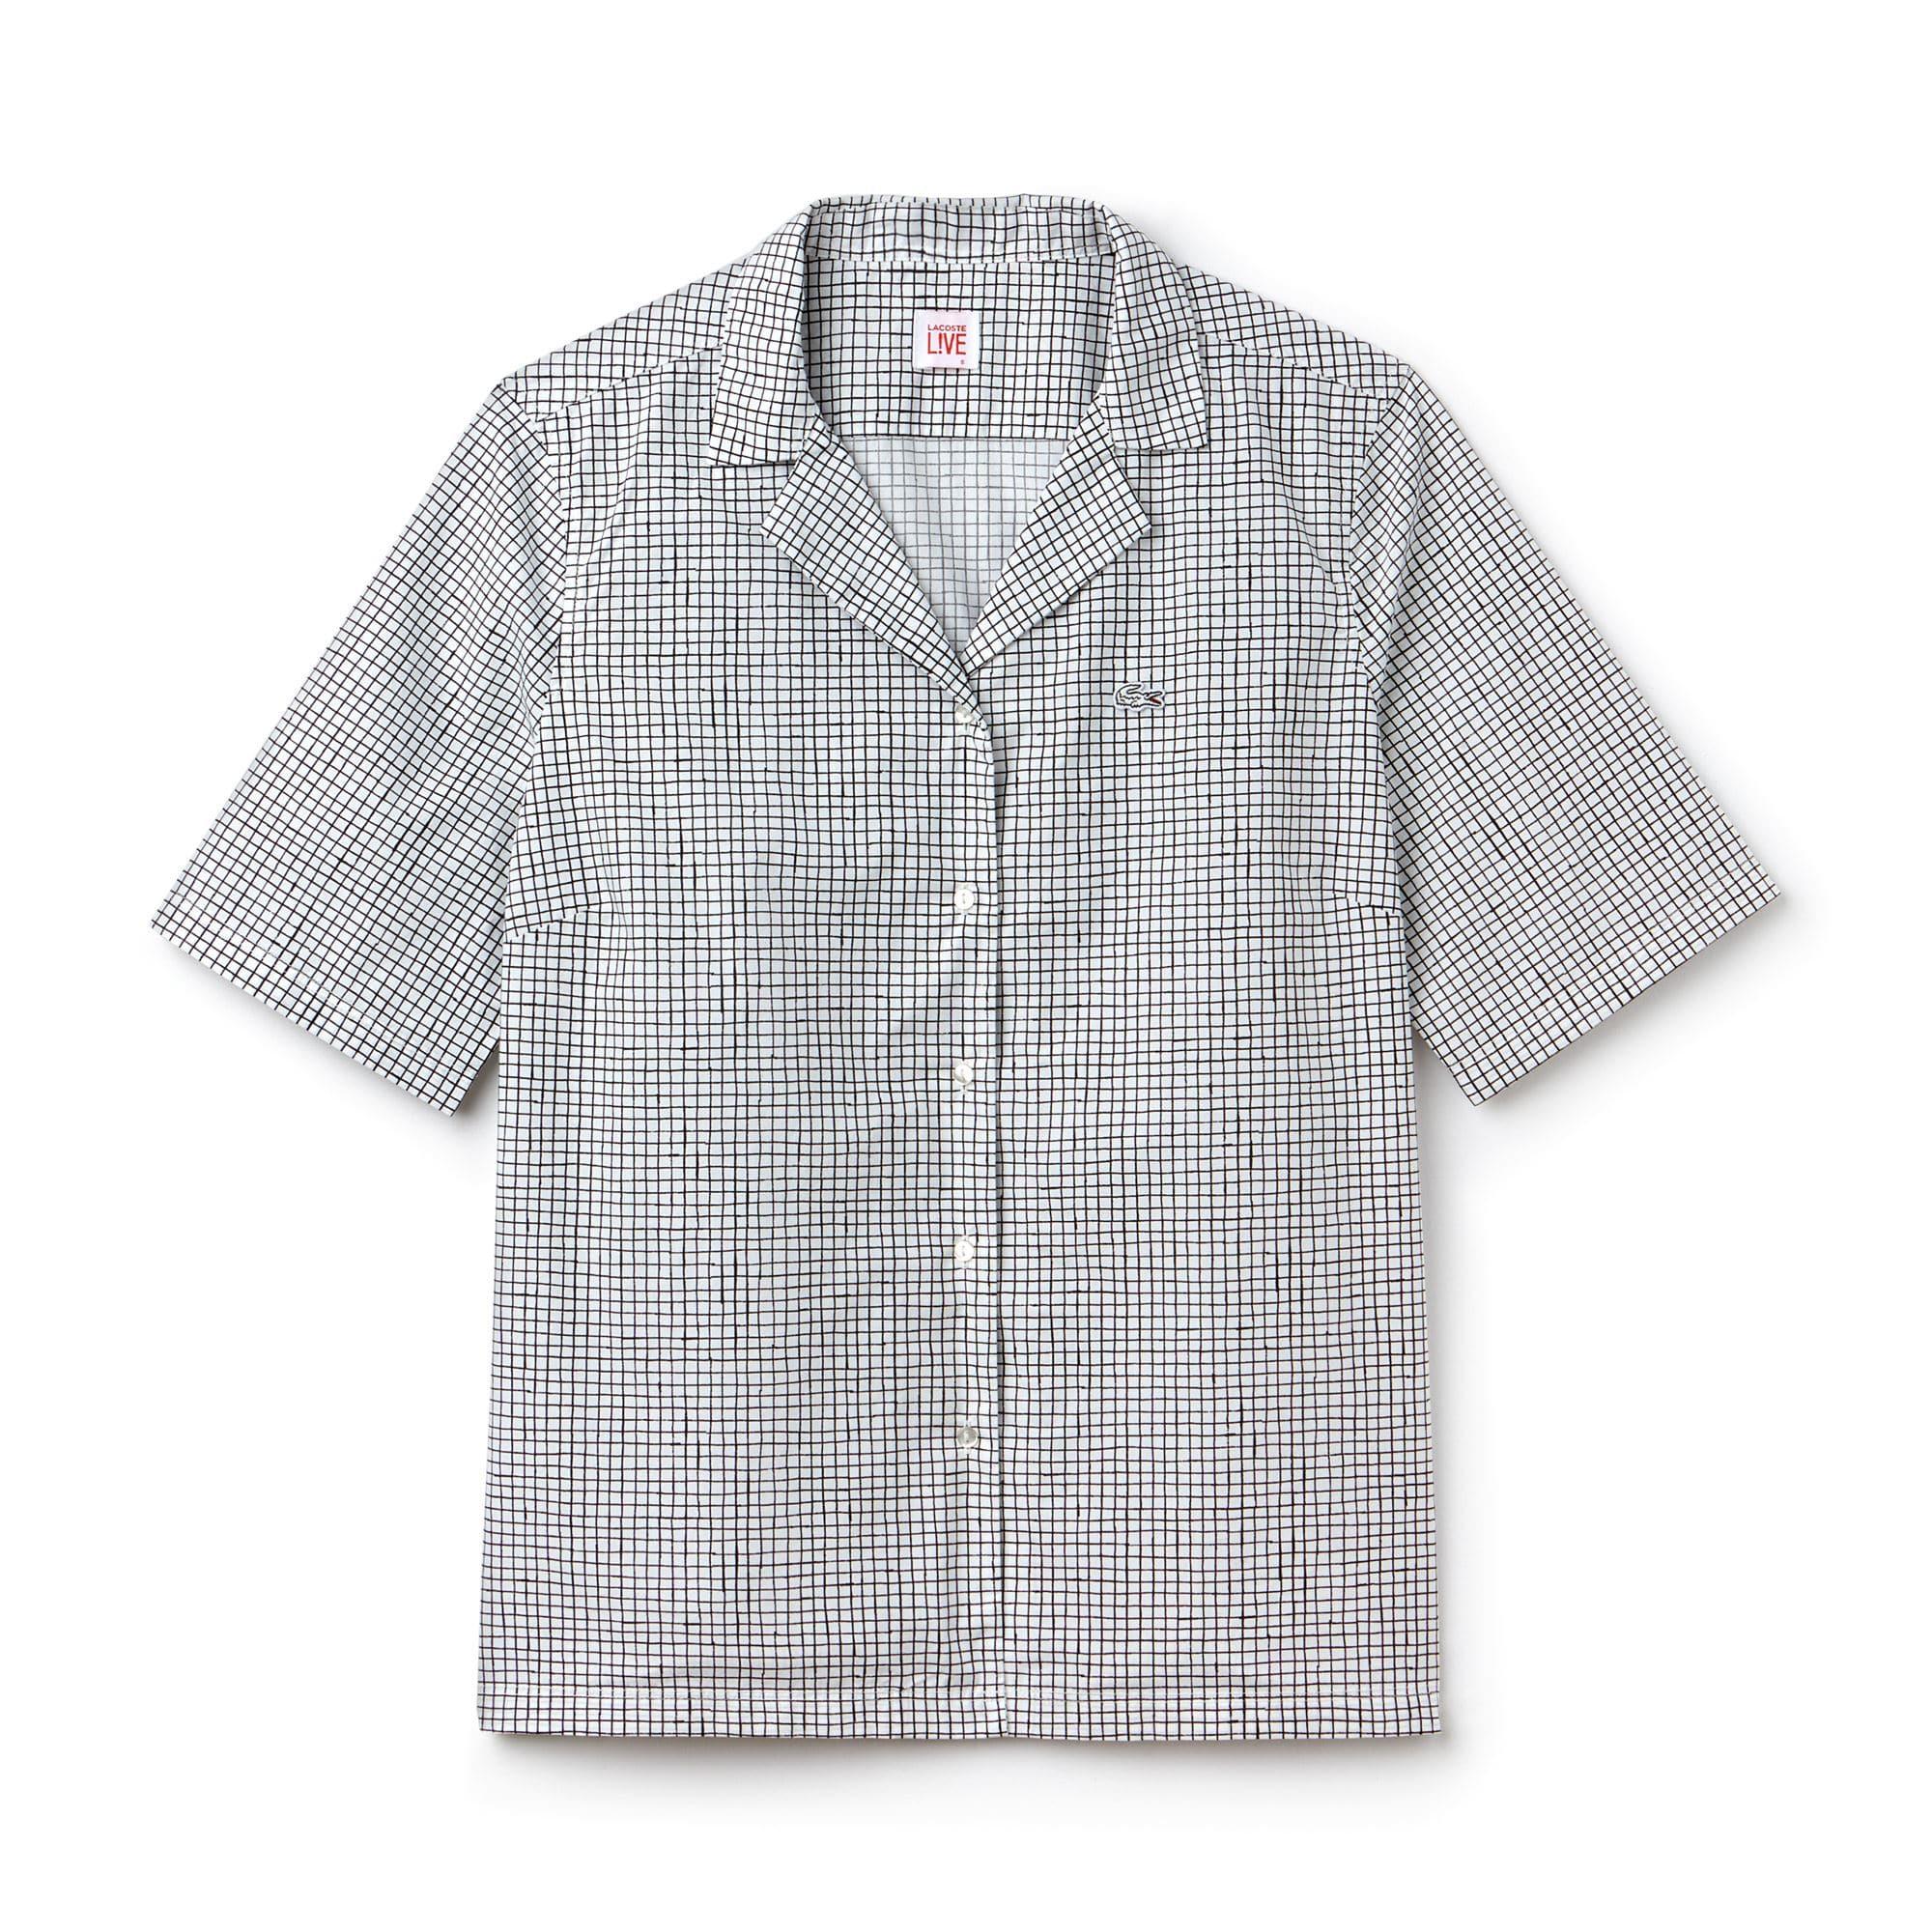 Camisa Lacoste LIVE de manga curta em popelina impressa